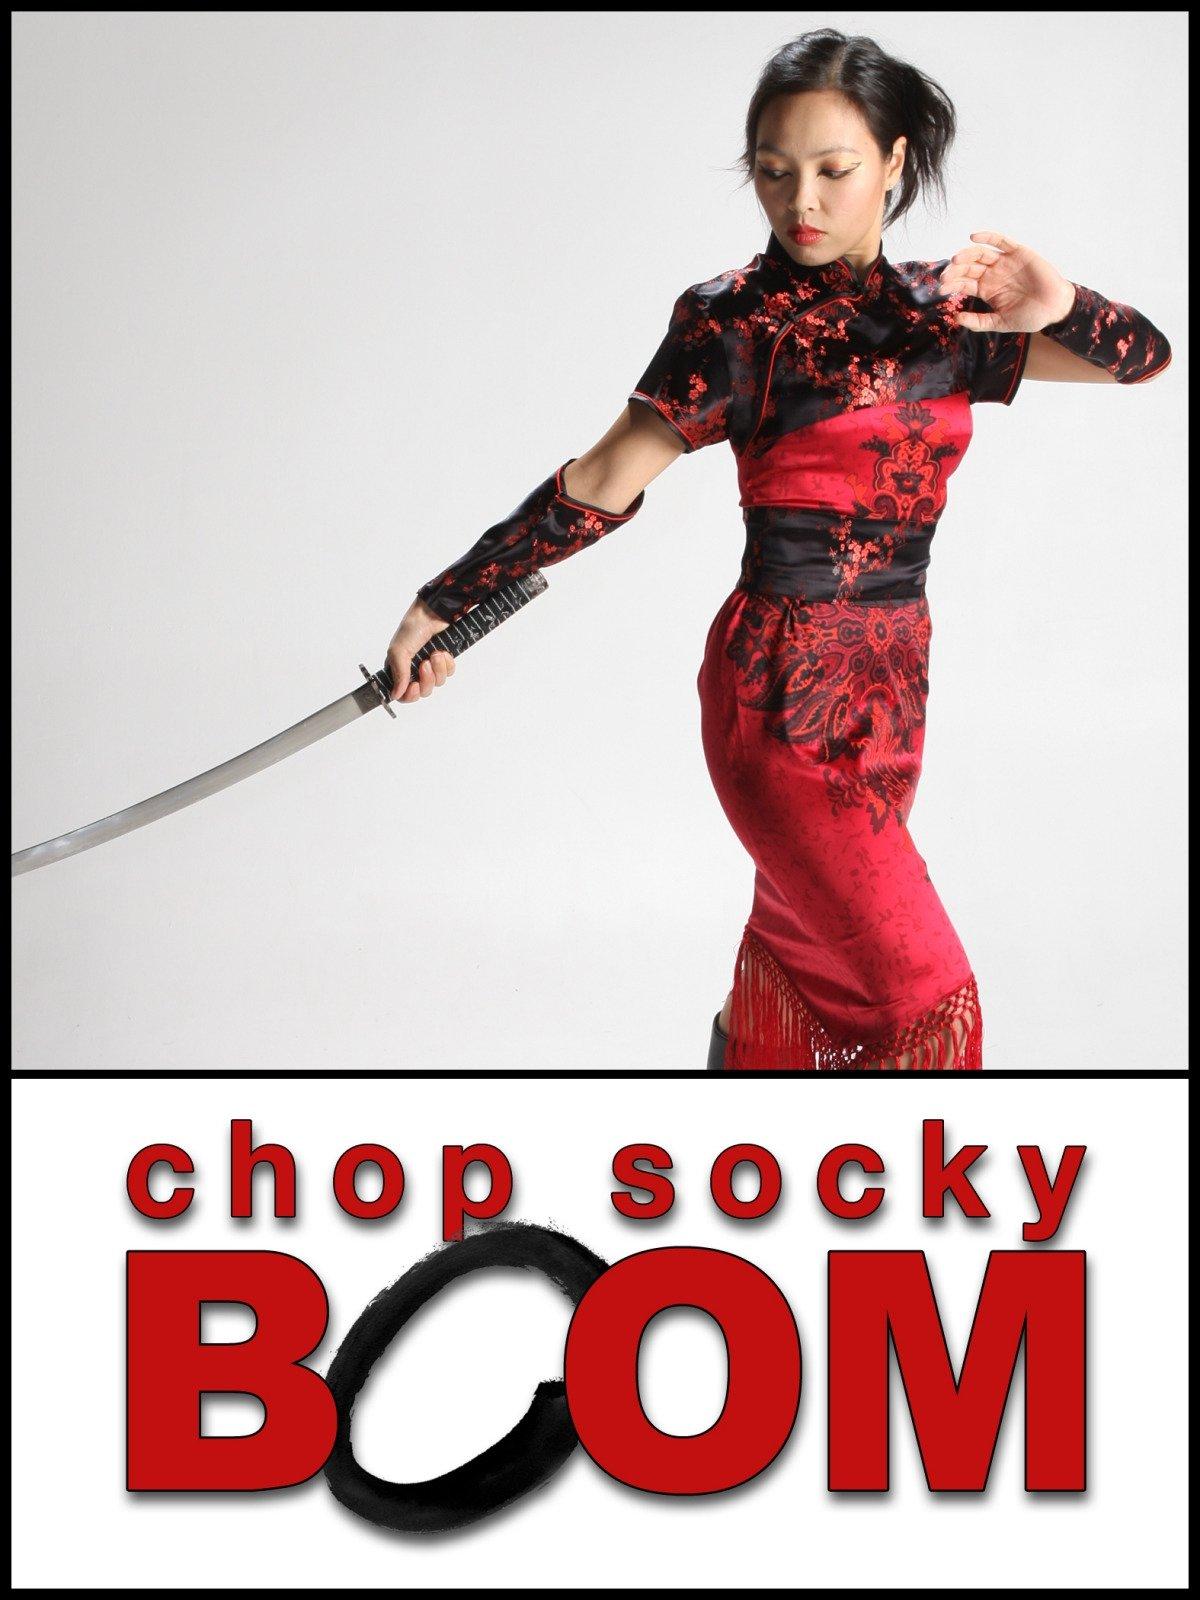 Chop Socky Boom